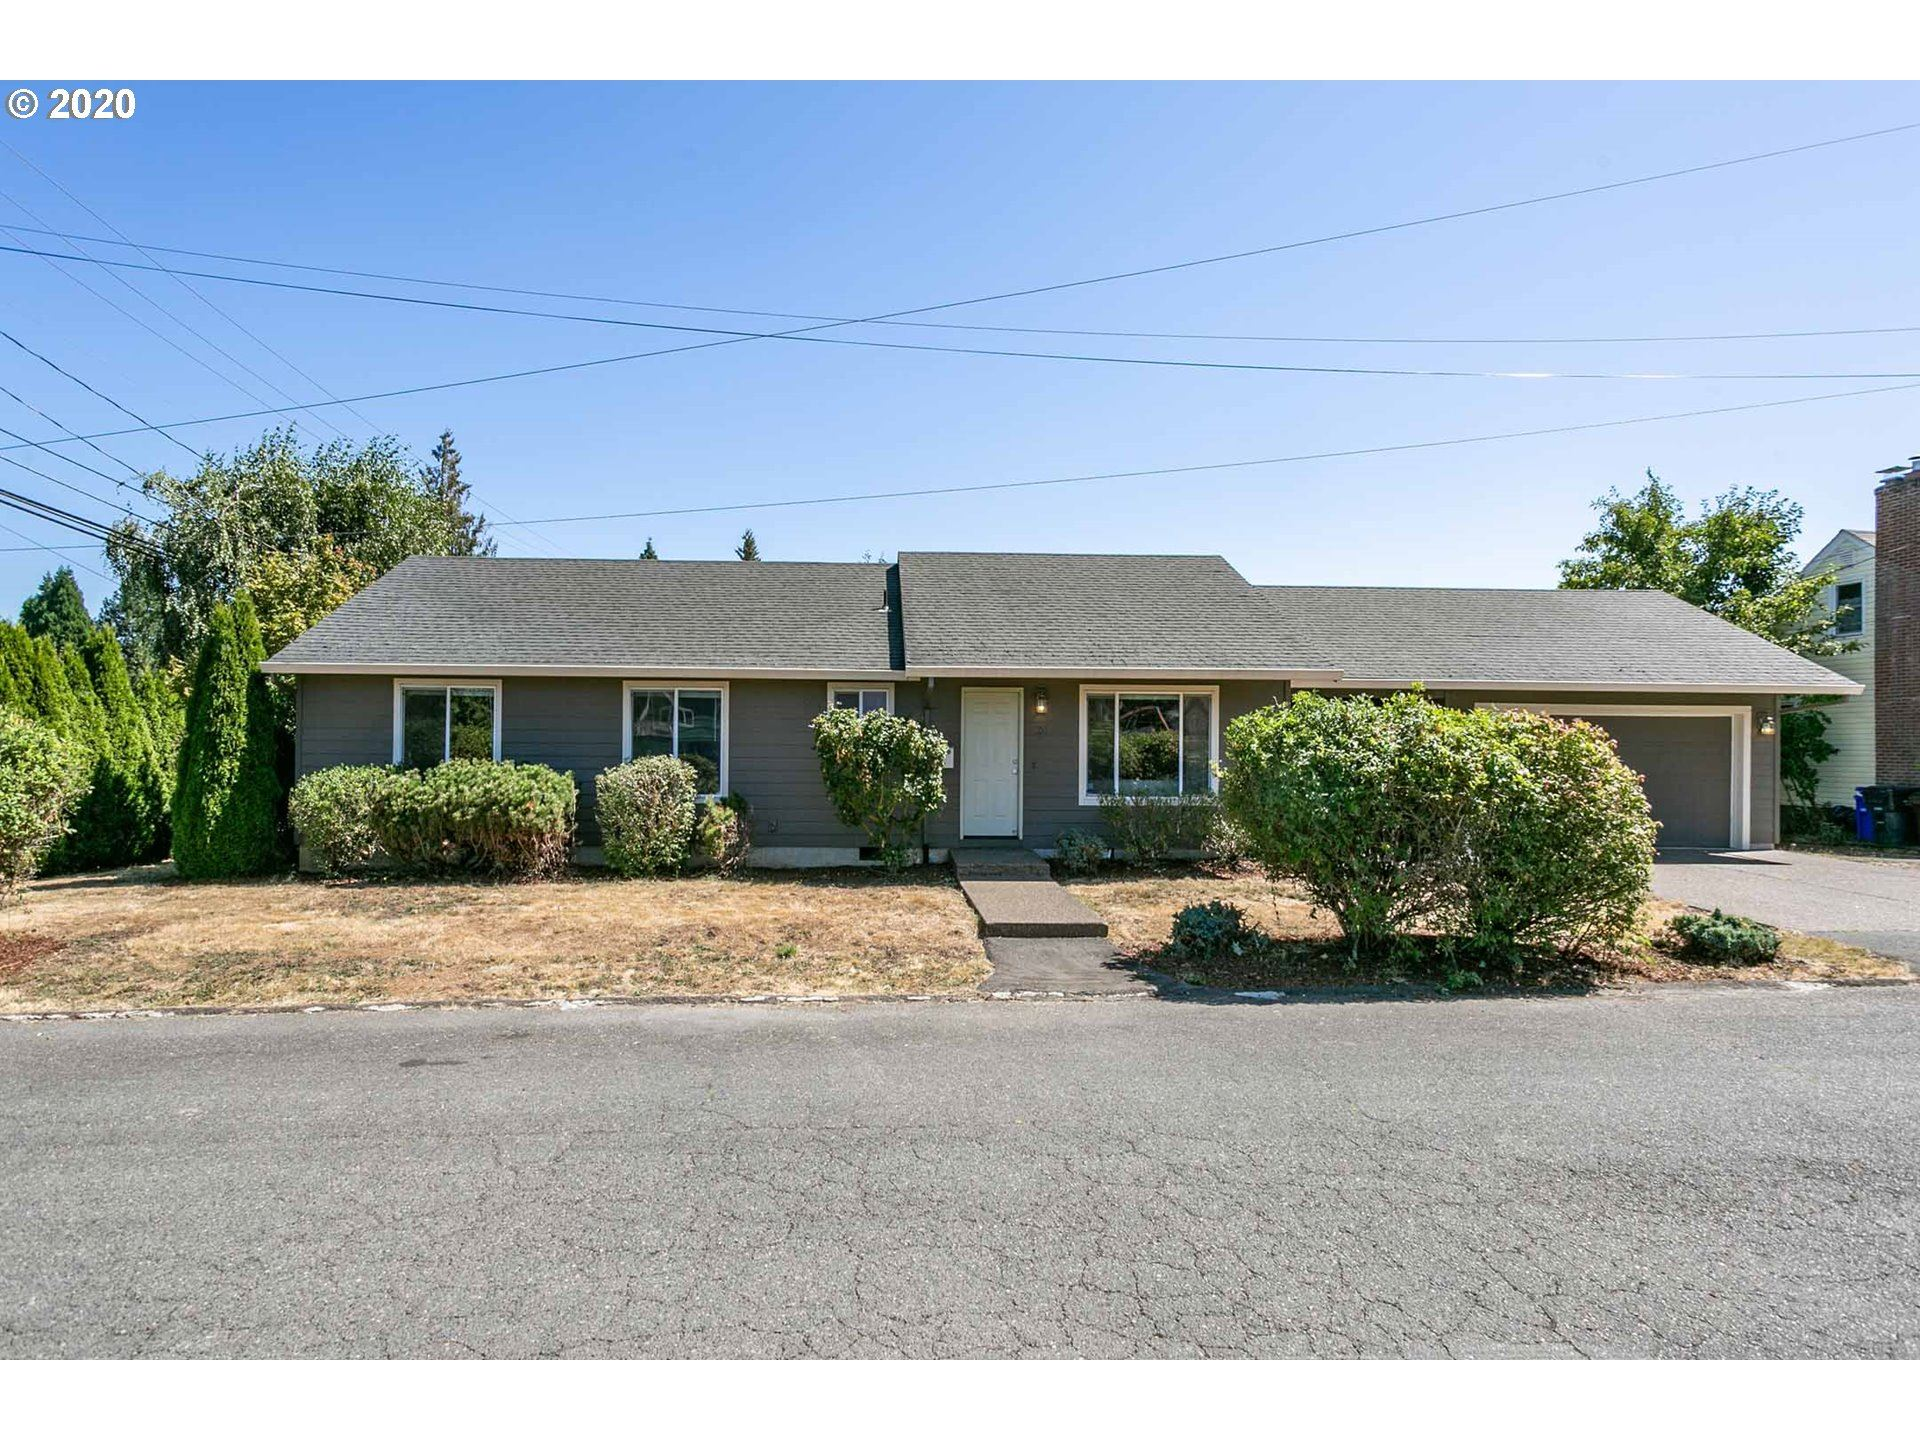 105 Warren ST, Oregon City, OR 97045 - MLS#: 20623302